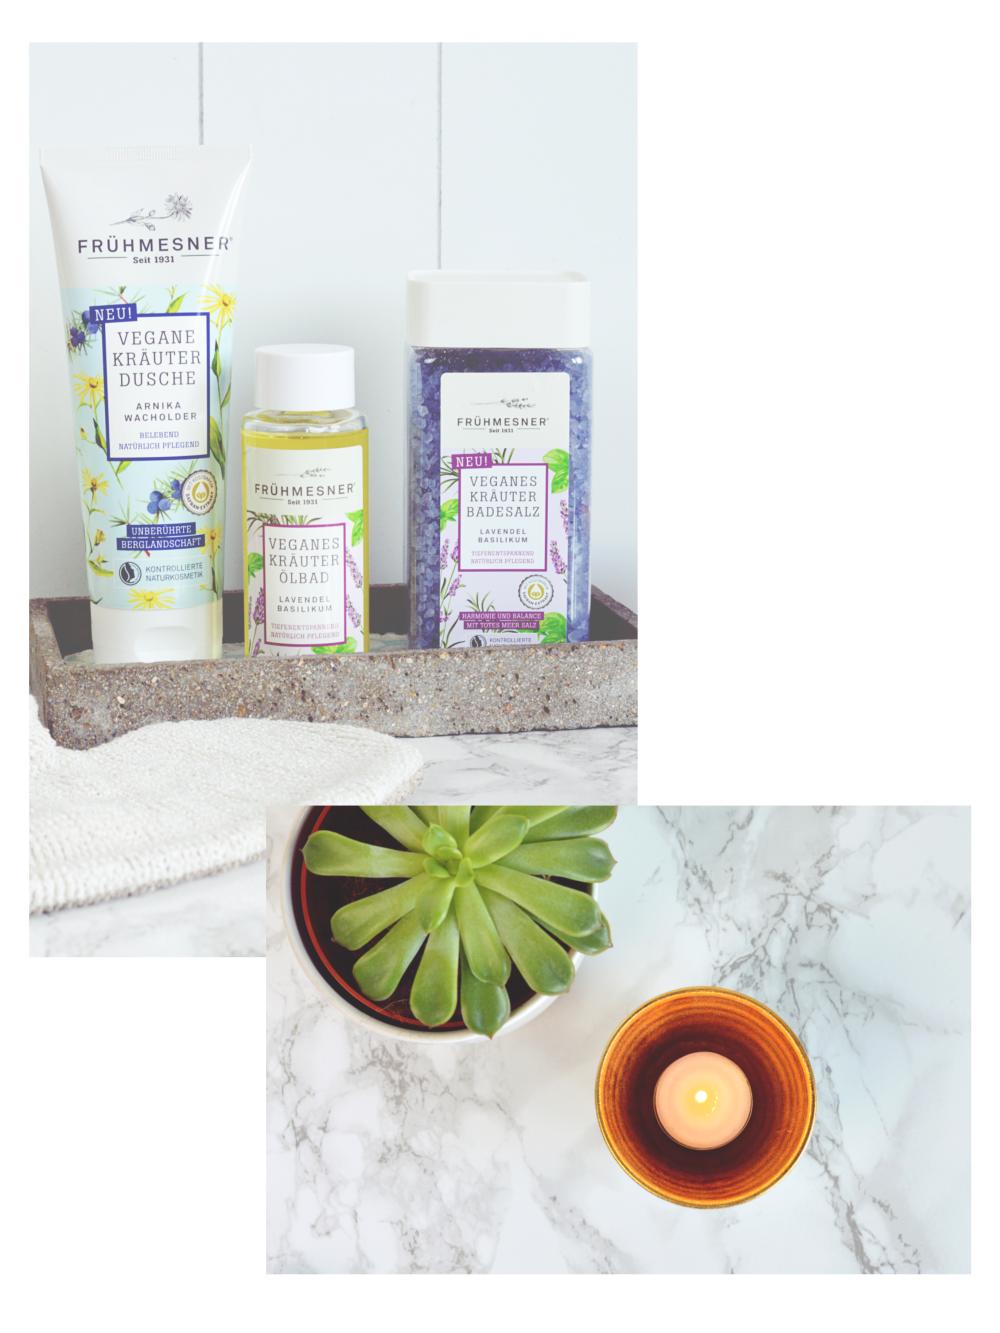 Vegane Produkte Home Spa mit Frühmesner